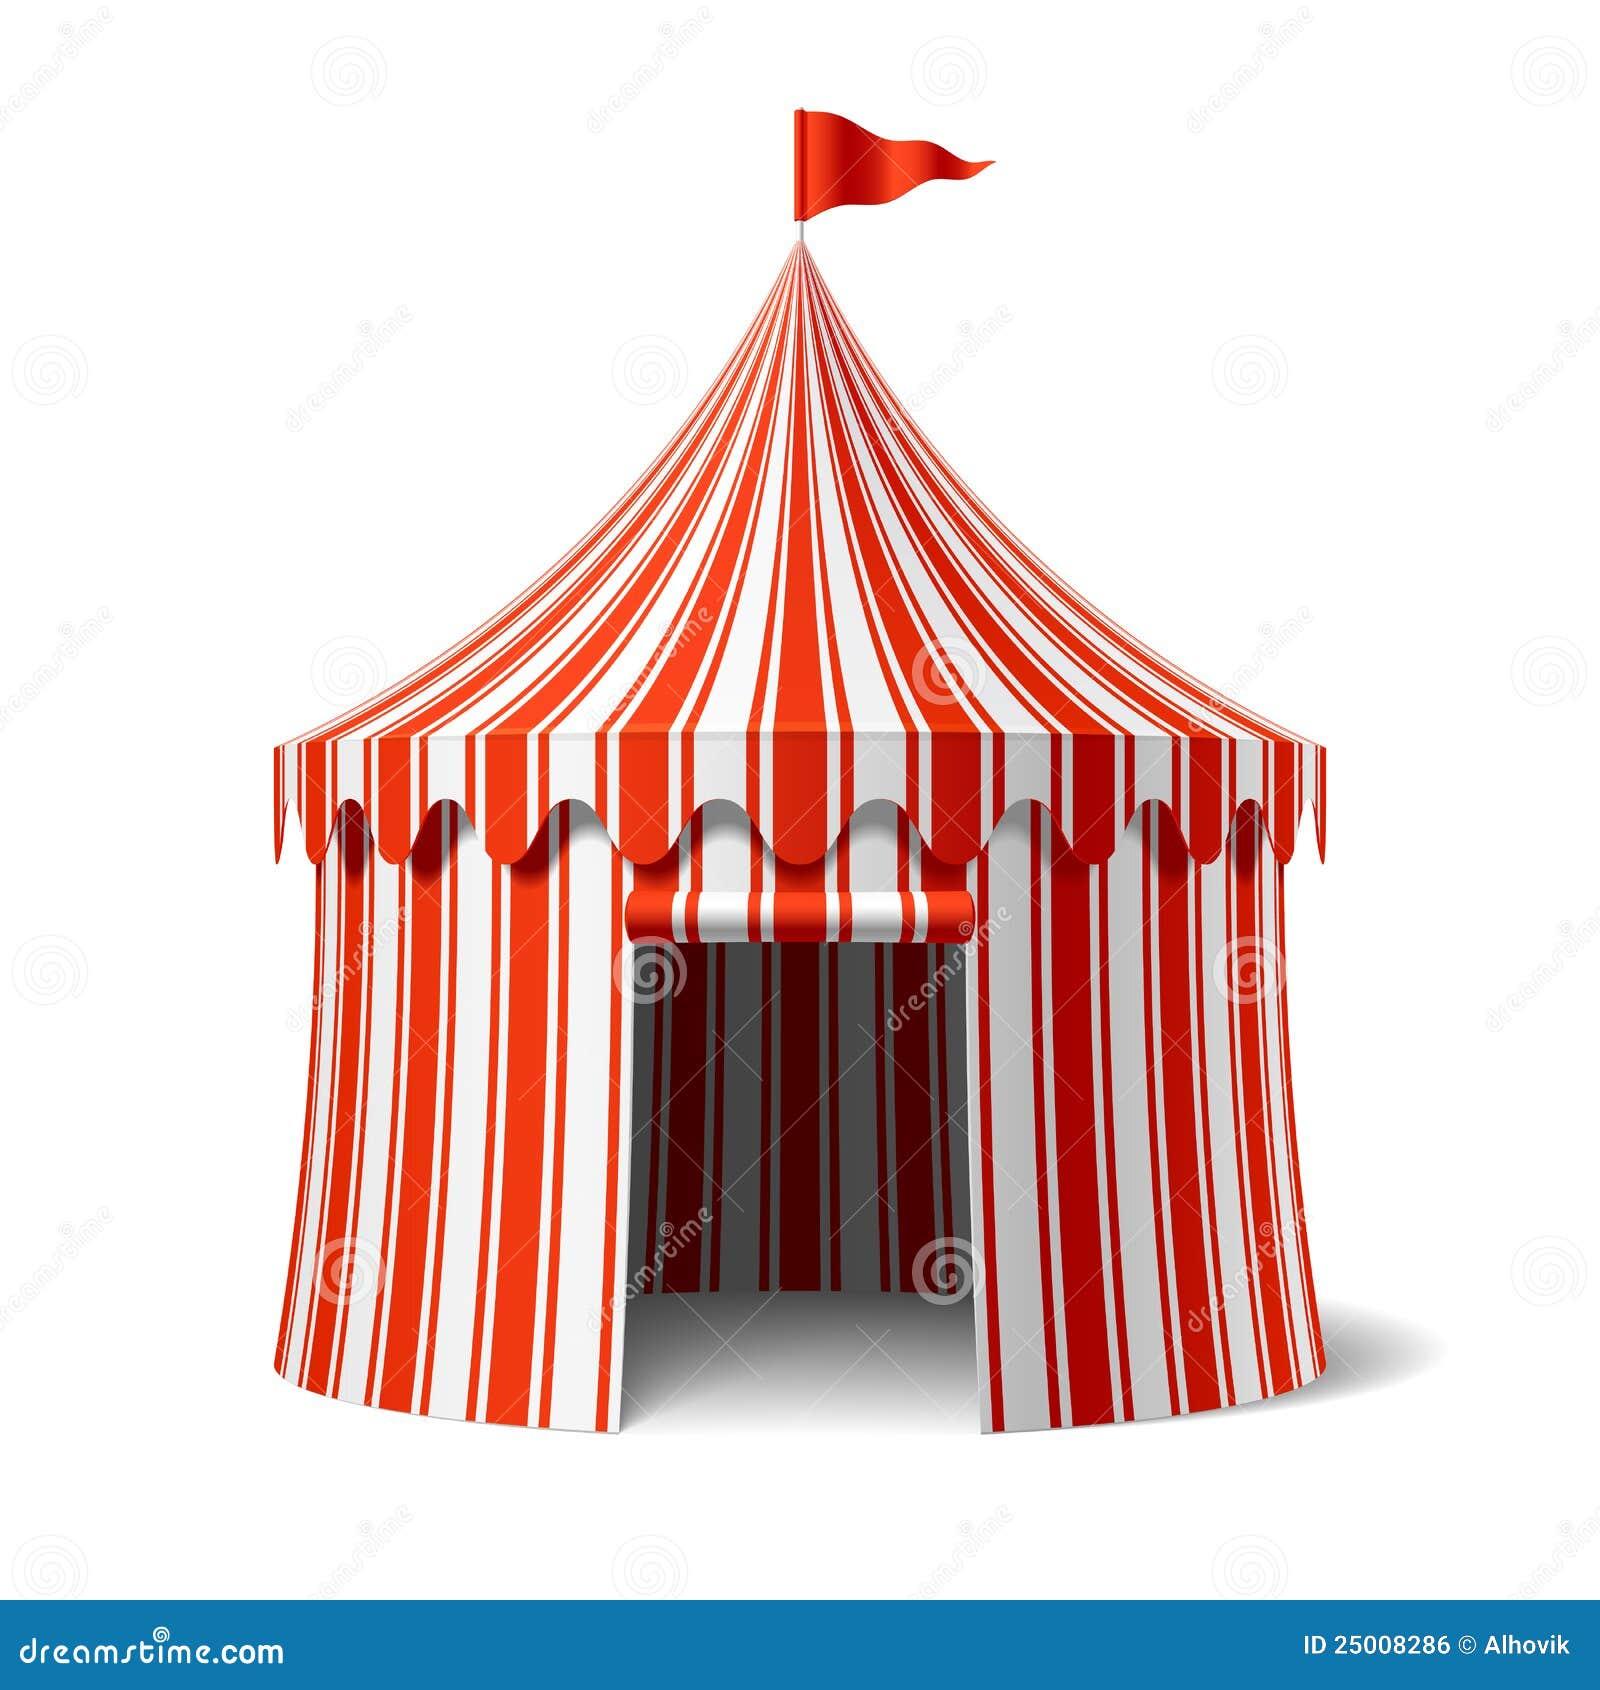 Circus tent  sc 1 st  Dreamstime.com & Circus tent stock vector. Illustration of stripes festival - 25008286